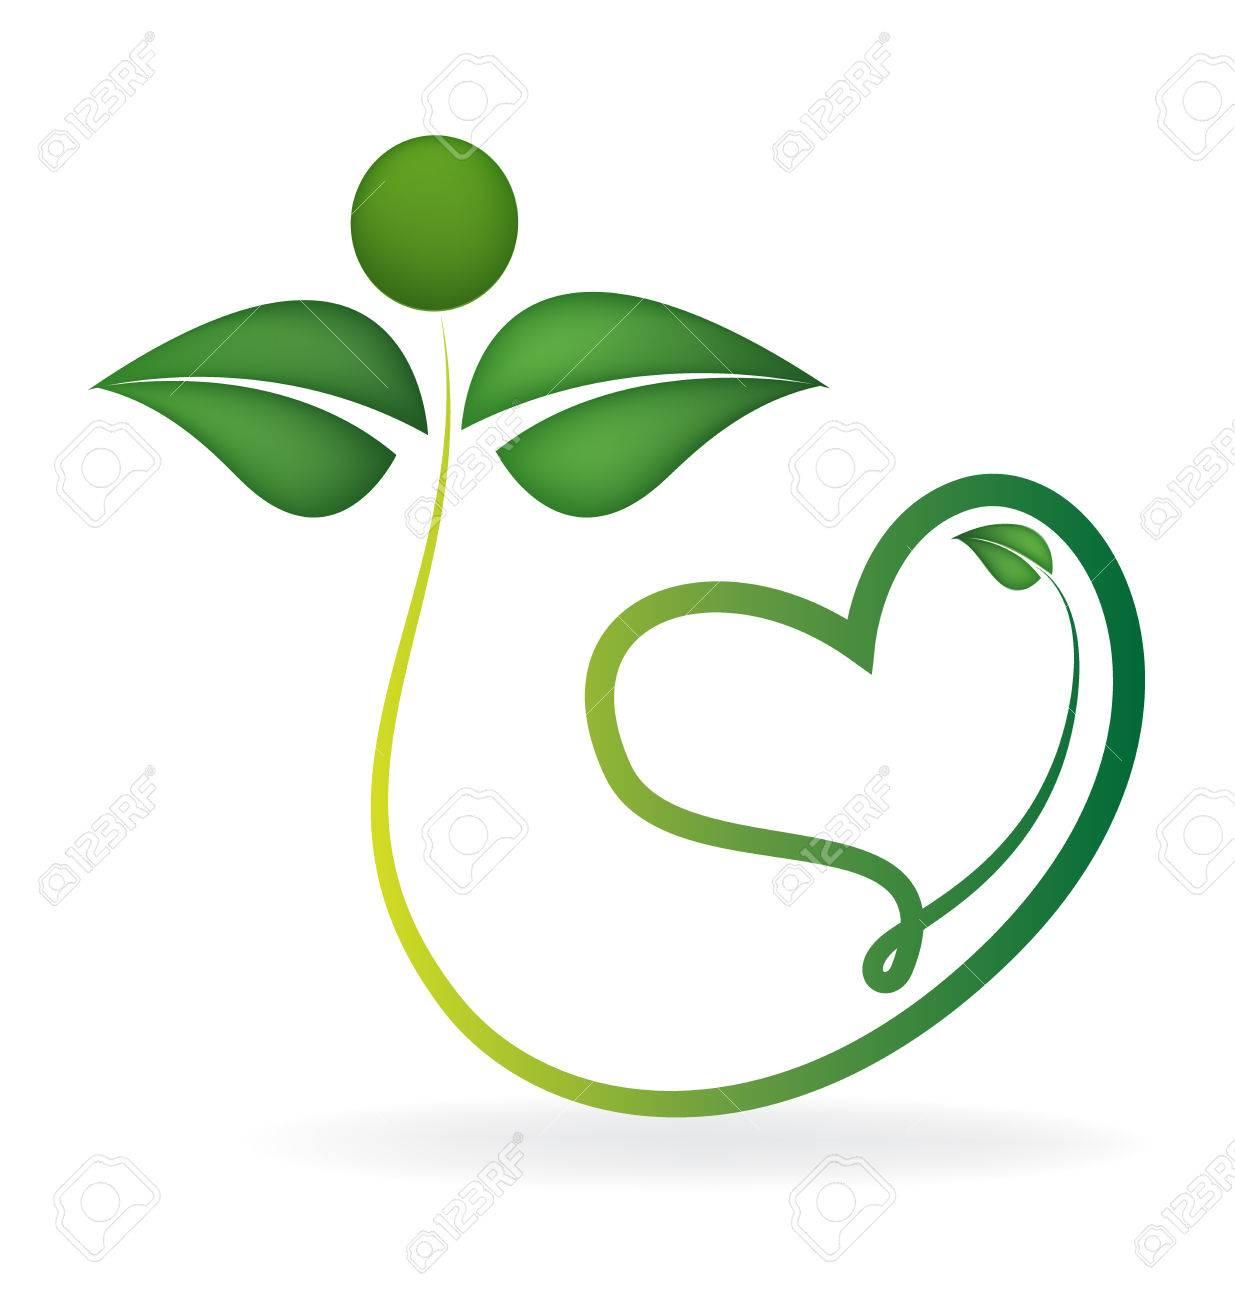 Gesunde Grüne Blätter Mit Herzform Symbol Vektor Logo Vorlage